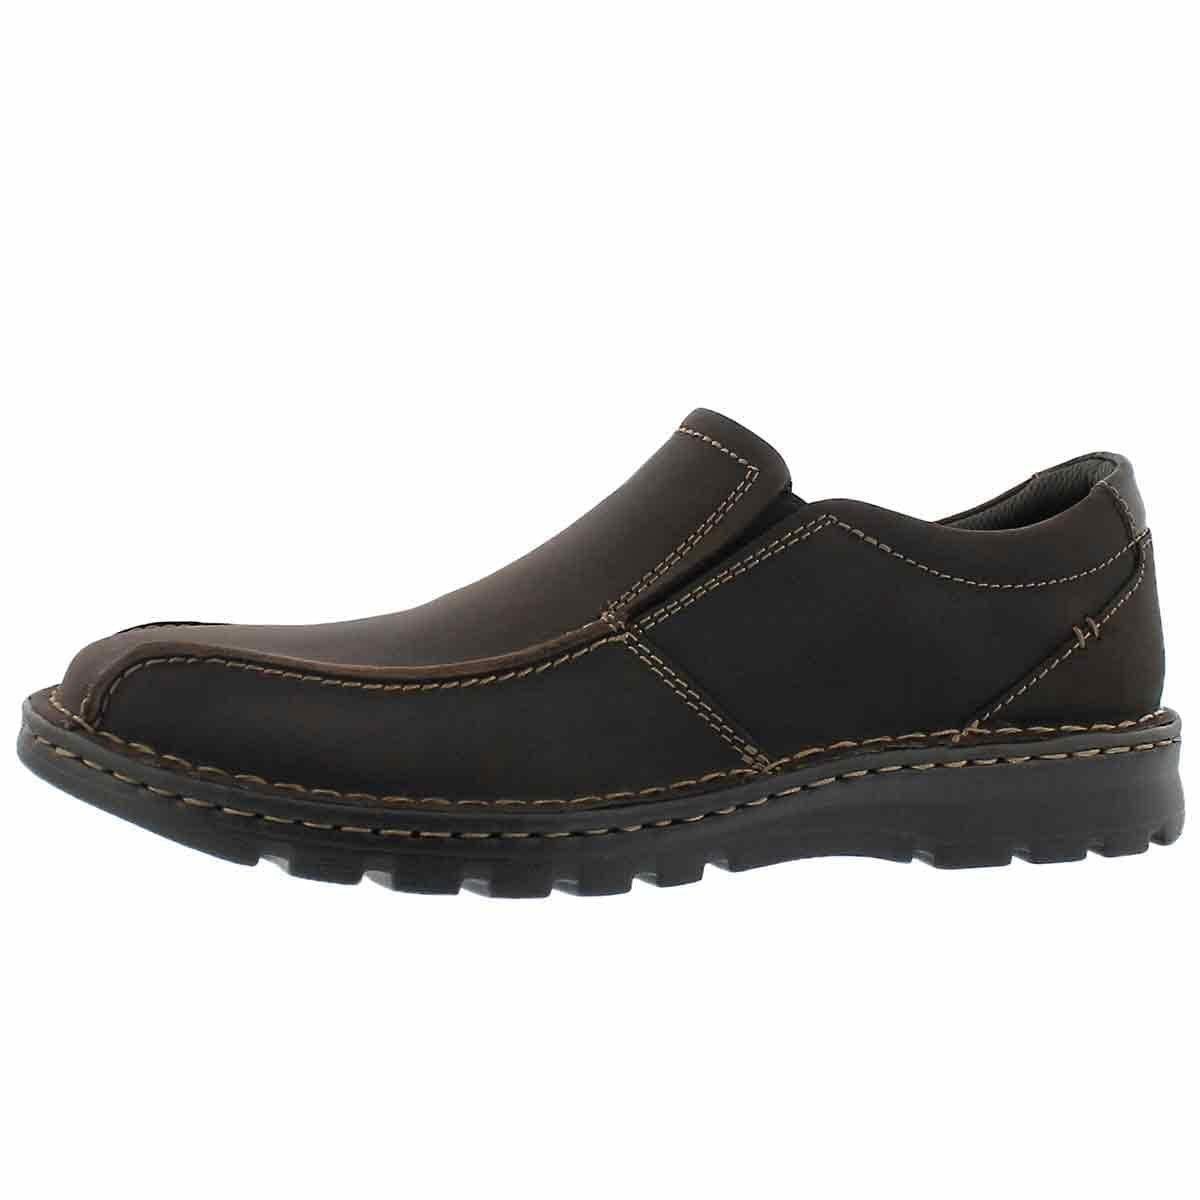 Dk brown Clarks Men's Vanek Step Loafers